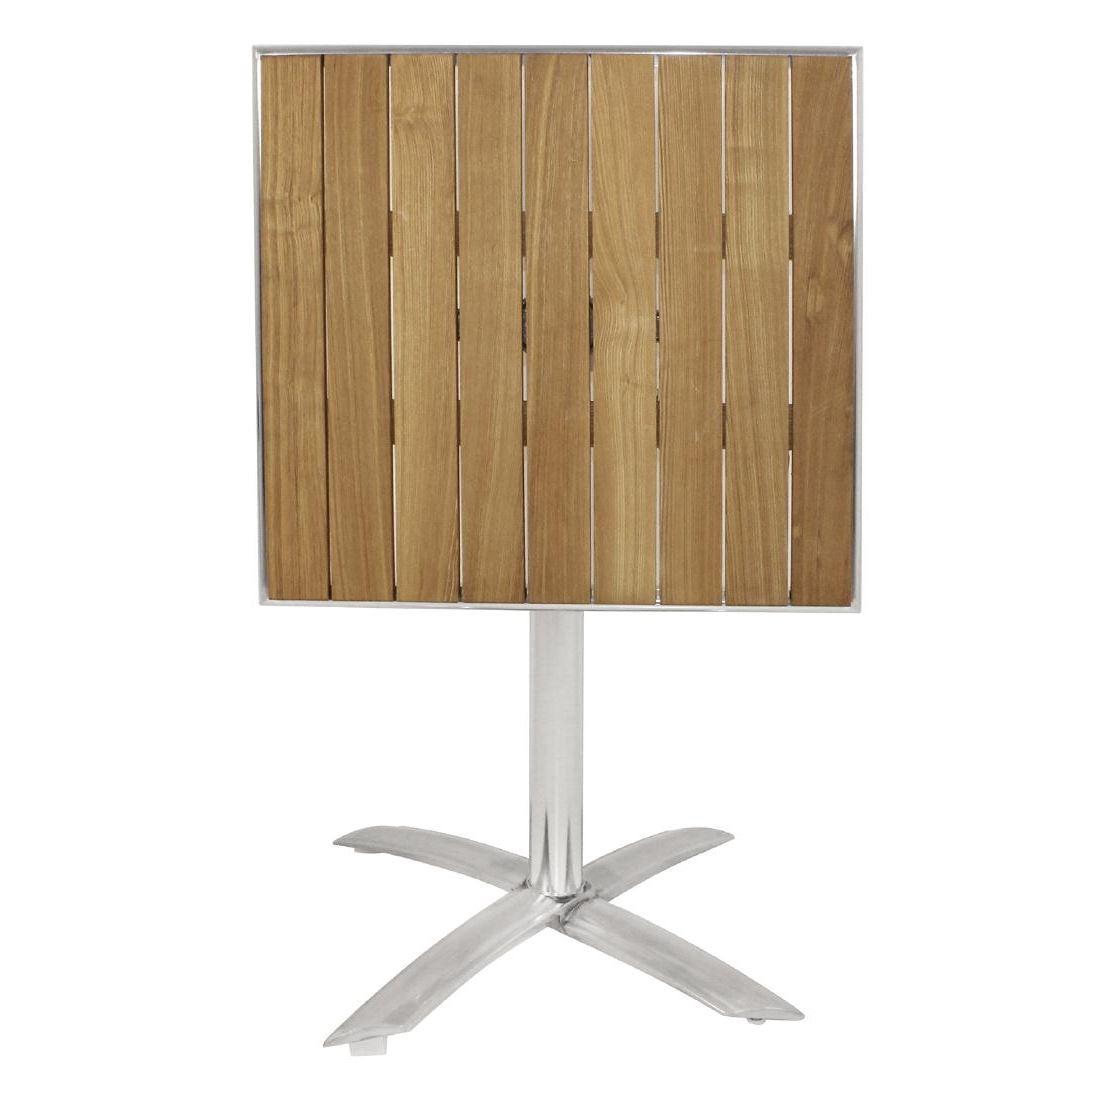 ... Bolero Flip Top Bistro Table Square Wood Dining Chairs Patio Bar  Restaurant